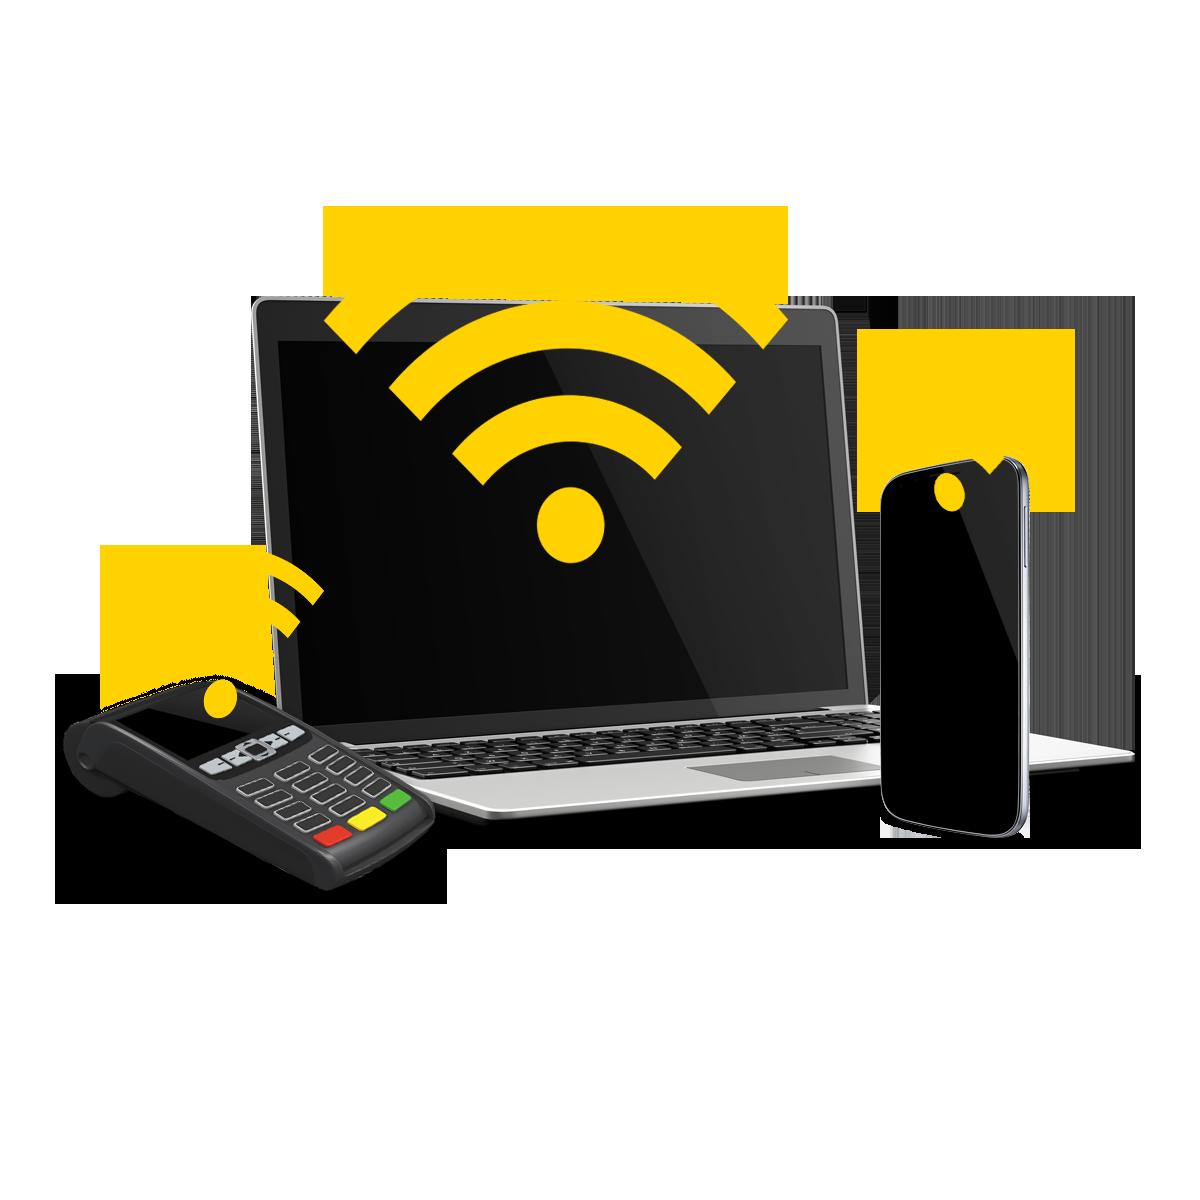 WI-FI PRO + INTERNET 200